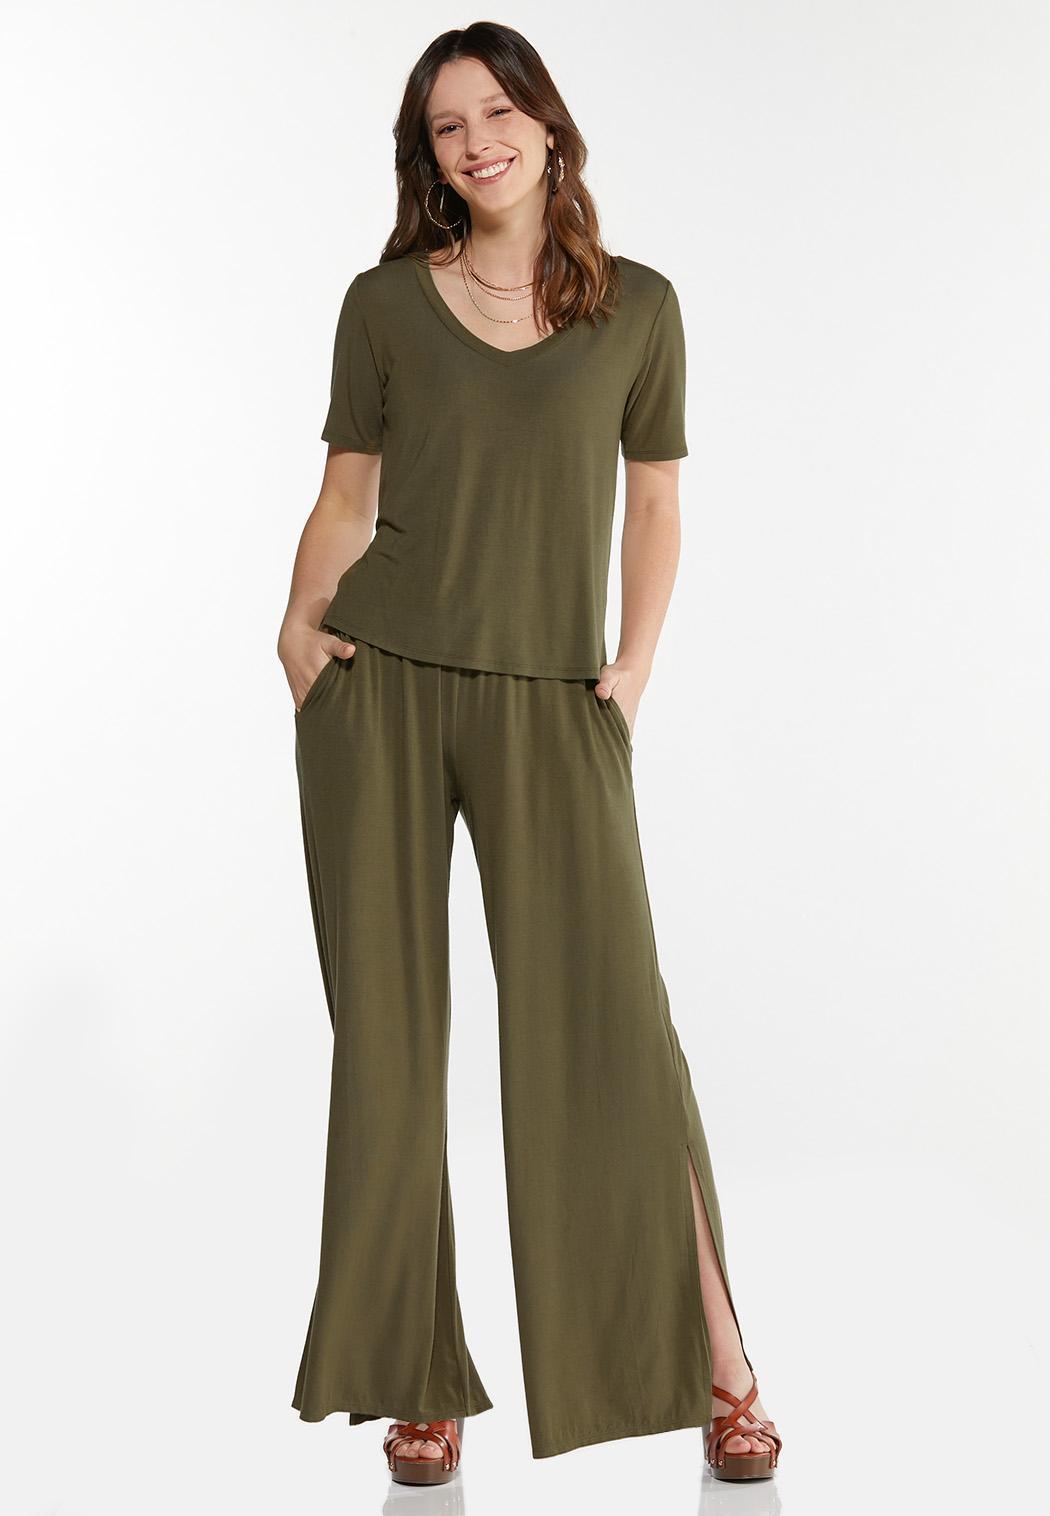 Olive Green Top (Item #44589655)